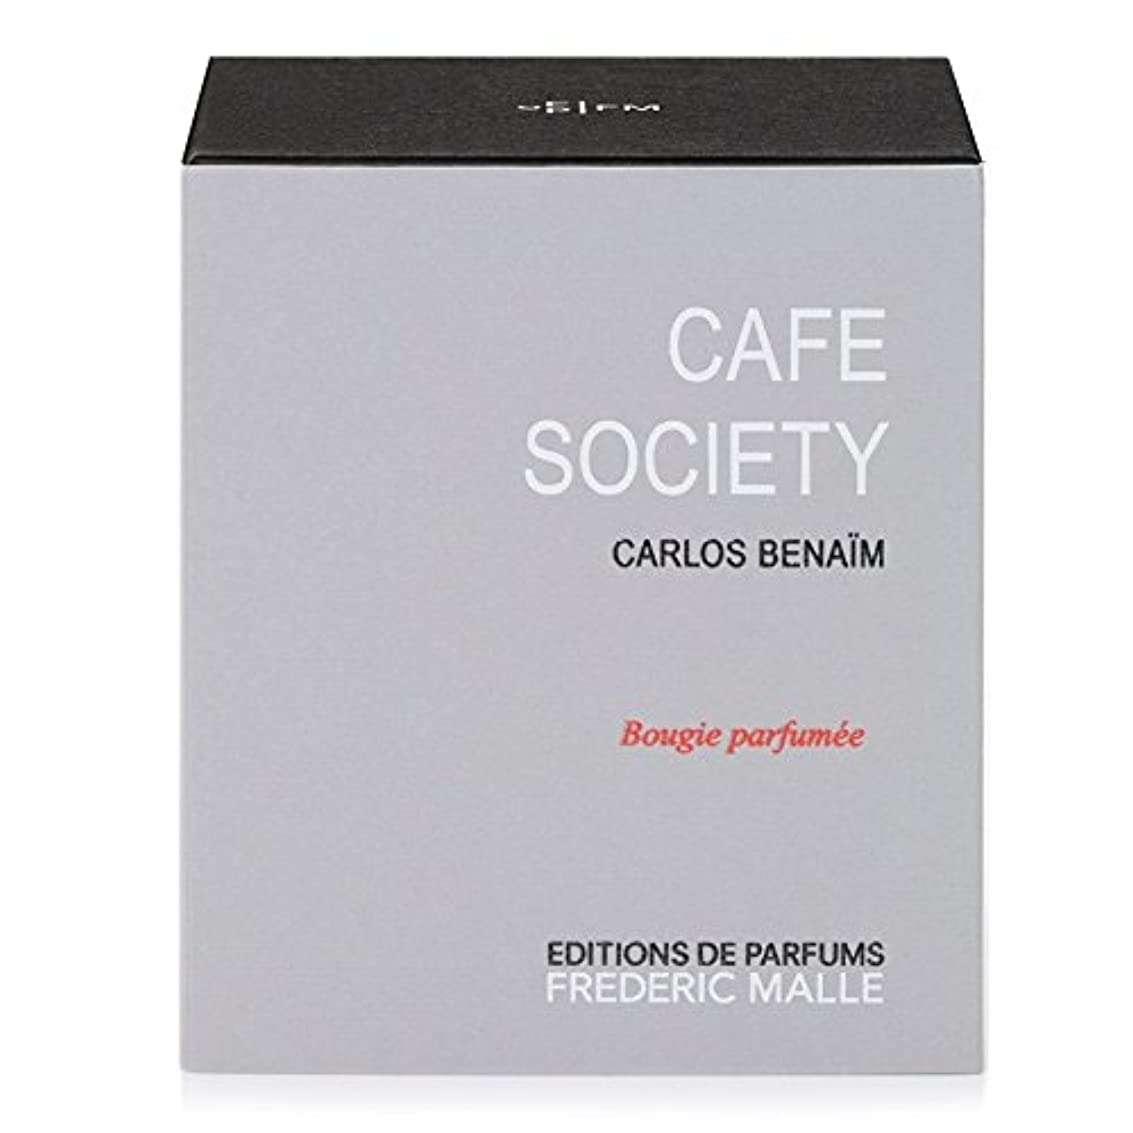 Frederic Malle Cafe Society Scented Candle 220g - フレデリック?マルカフェ社会の香りのキャンドル220グラム [並行輸入品]